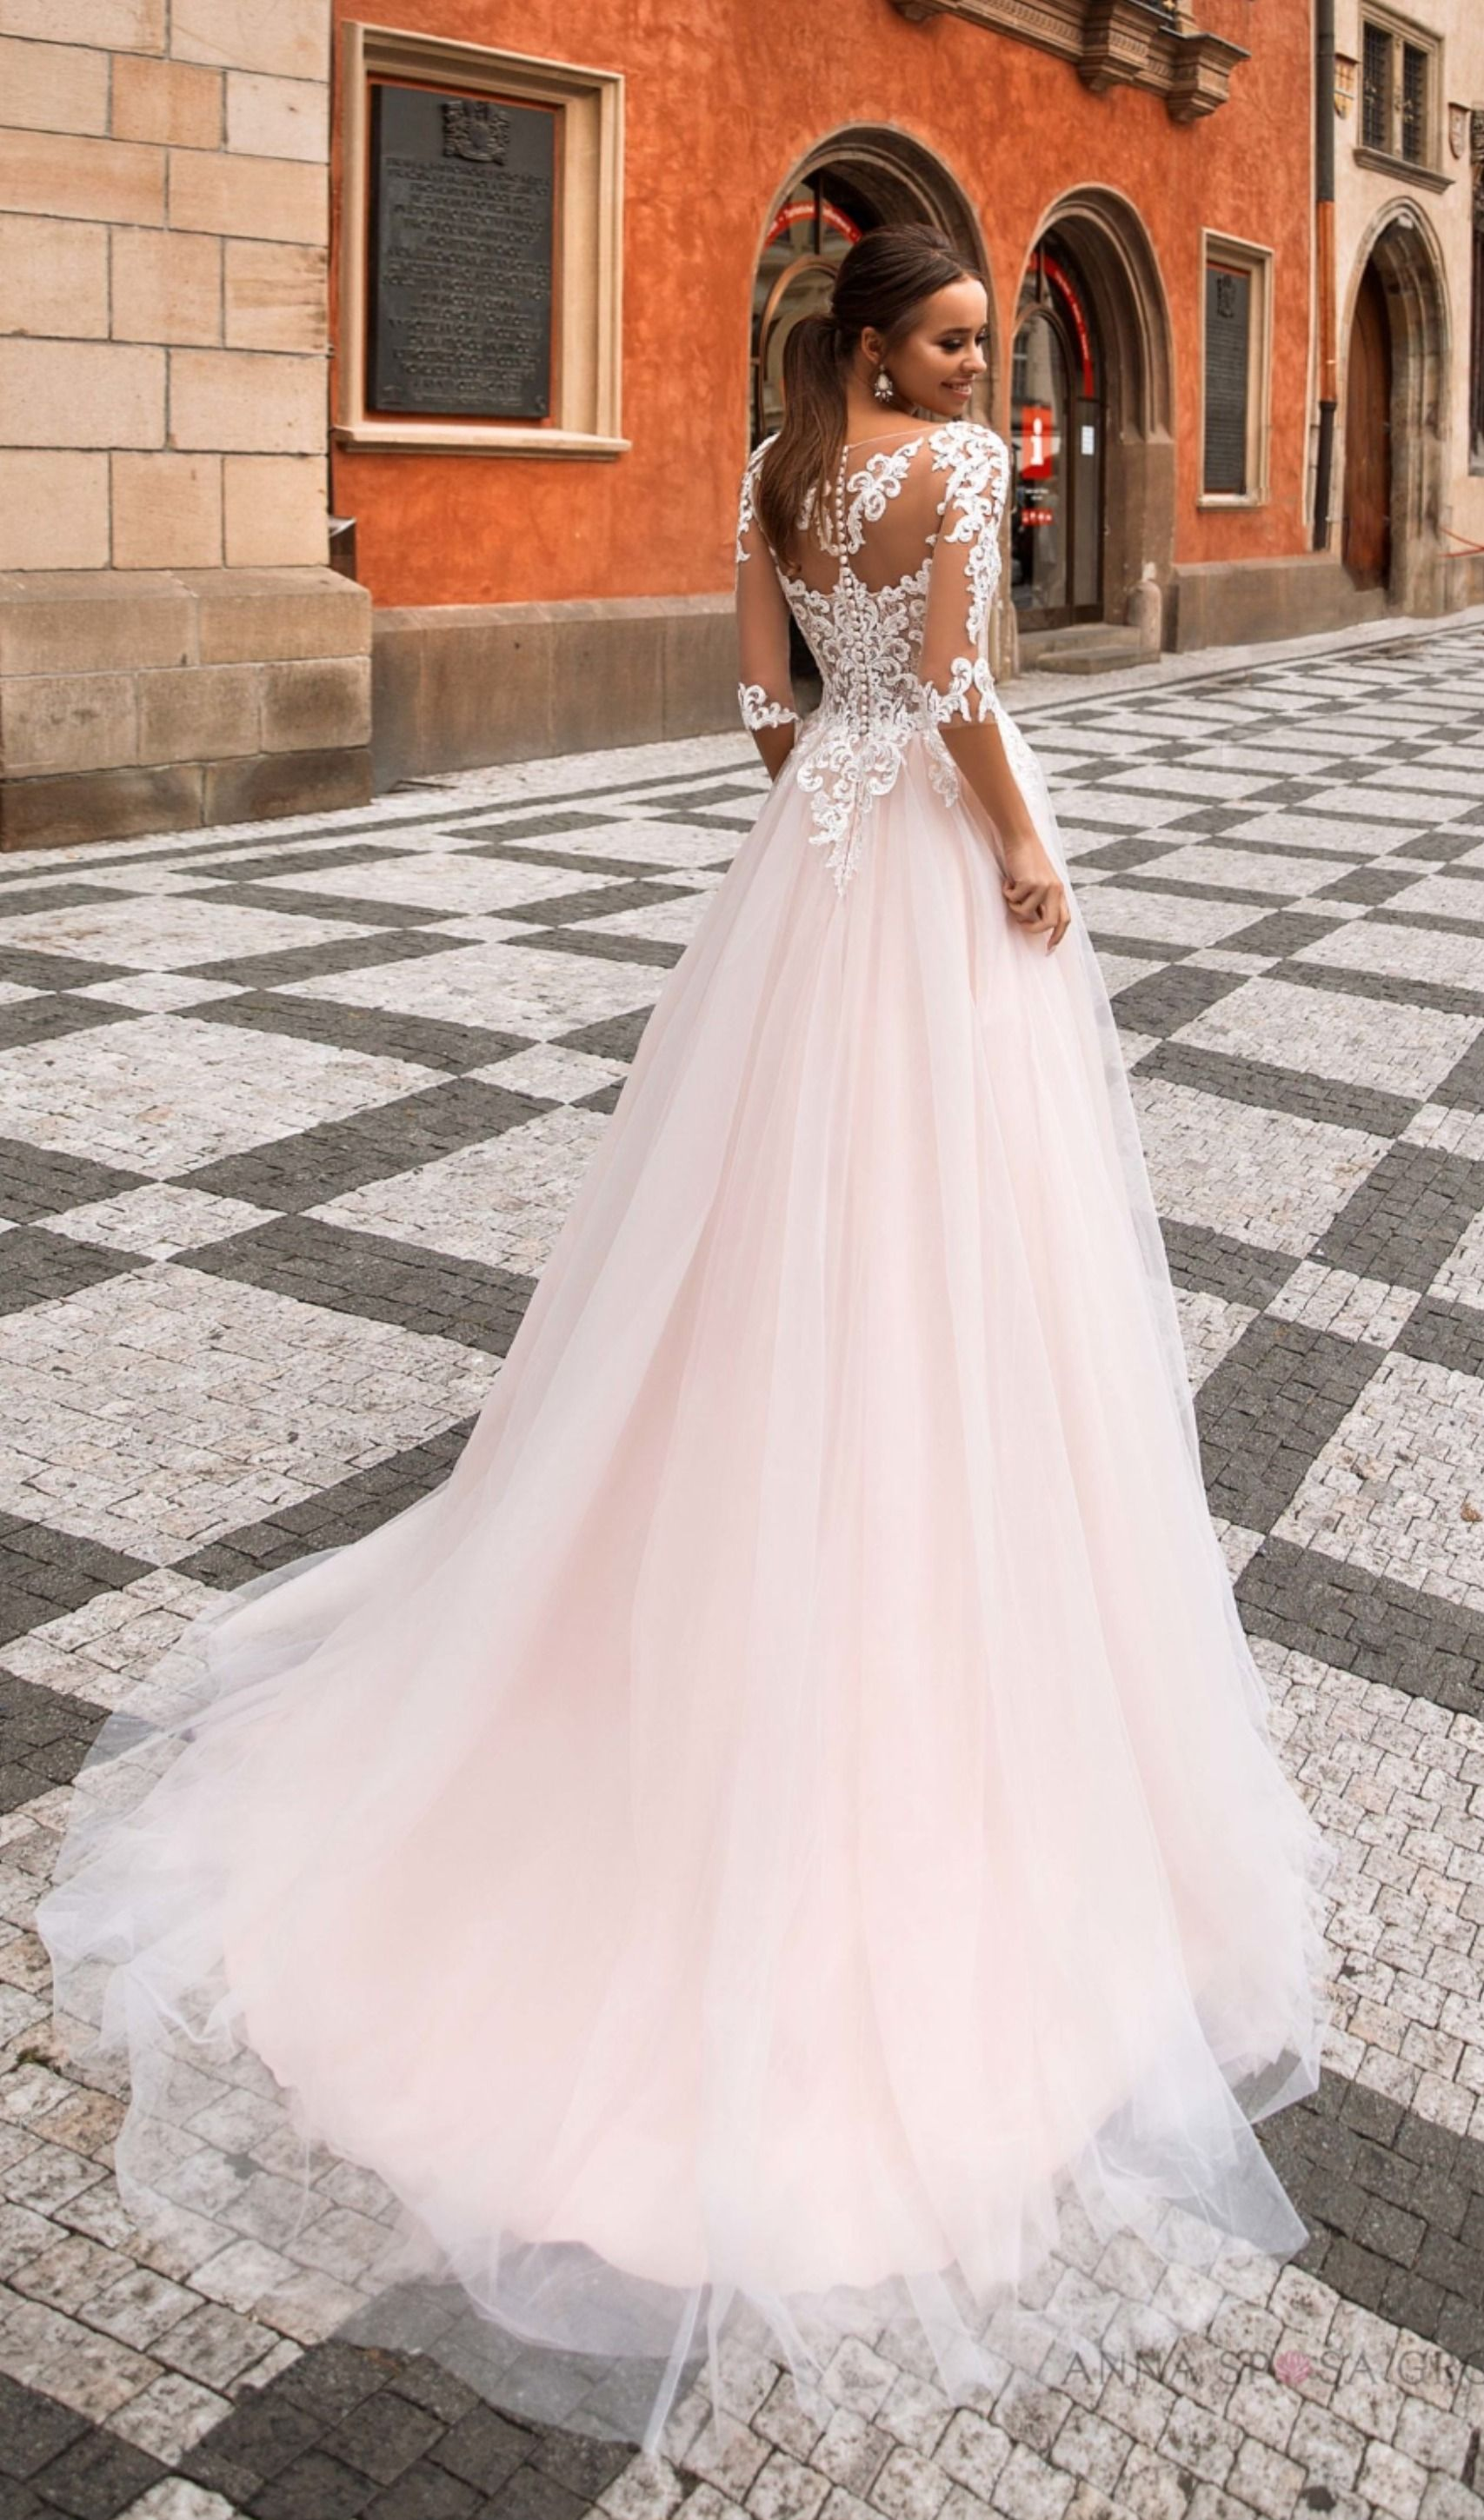 Mikaela Wedding Dress Prague Collection Wedding Dresses Lace Blush Pink Wedding Dress Lace Wedding Dress With Sleeves [ 2899 x 1707 Pixel ]